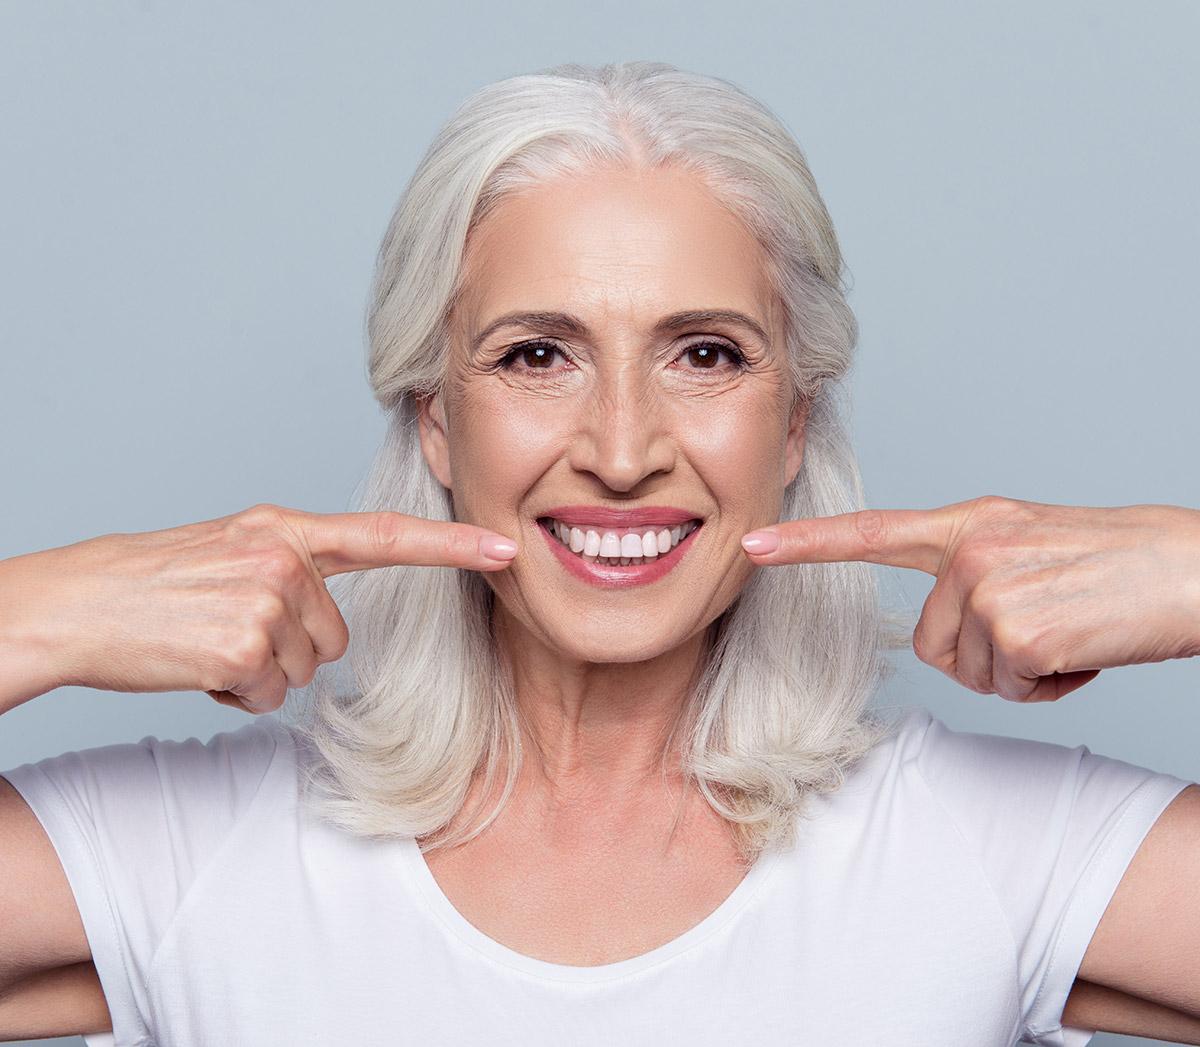 https://flossandsmile.co.uk/wp-content/uploads/2021/01/Floss-and-Smile-Dental-Service.jpg